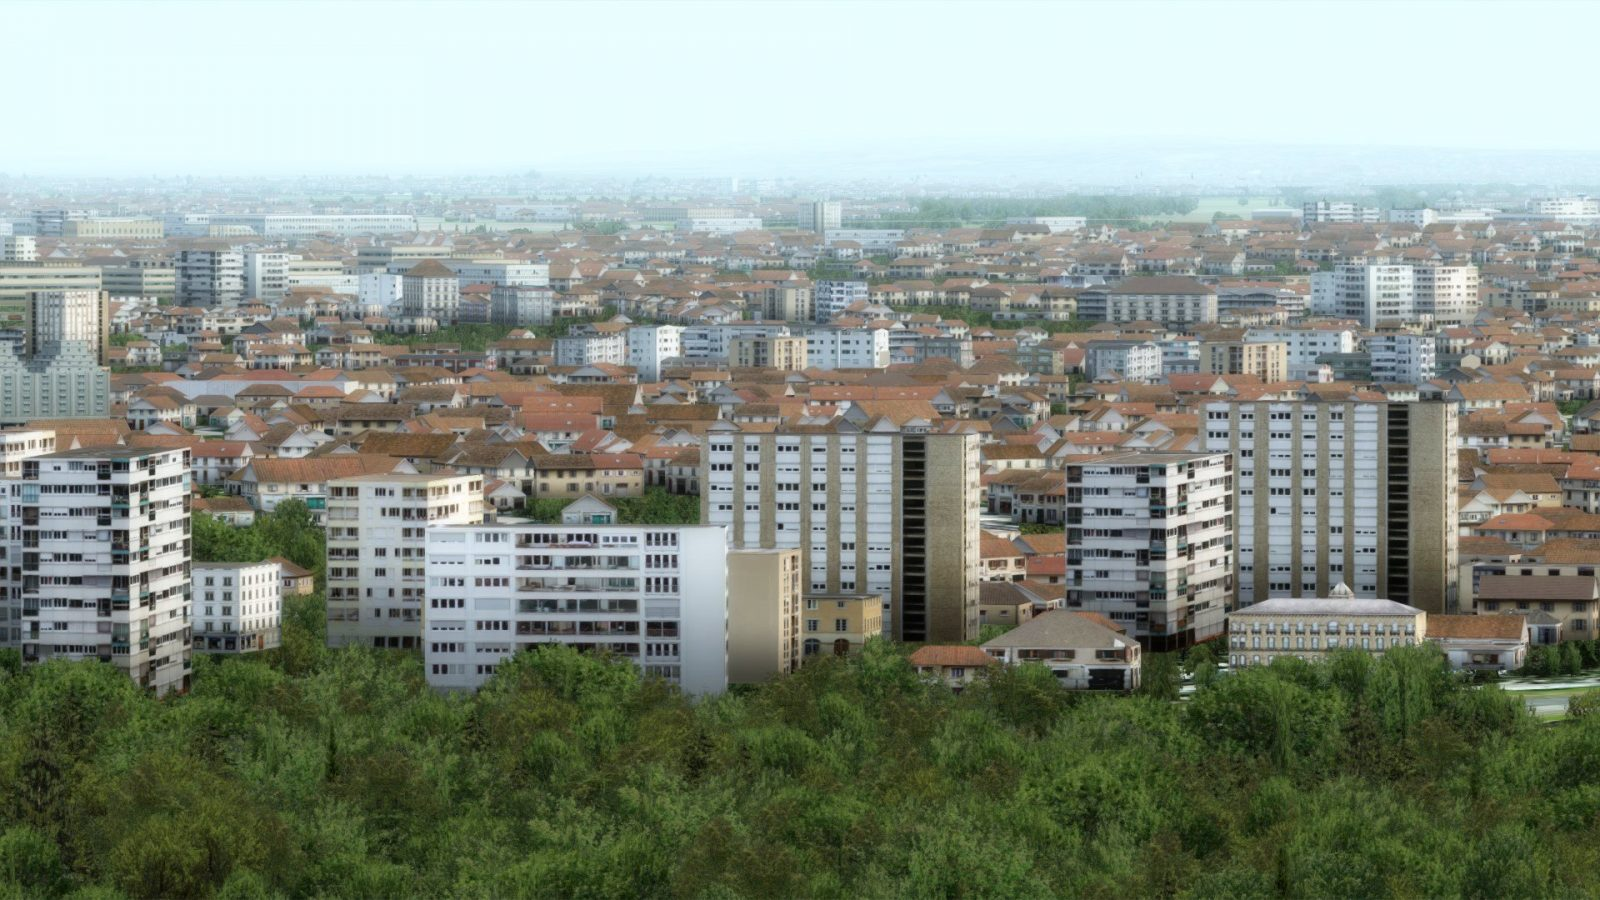 orbx-buildings-hd-previews-11-1600x900.j